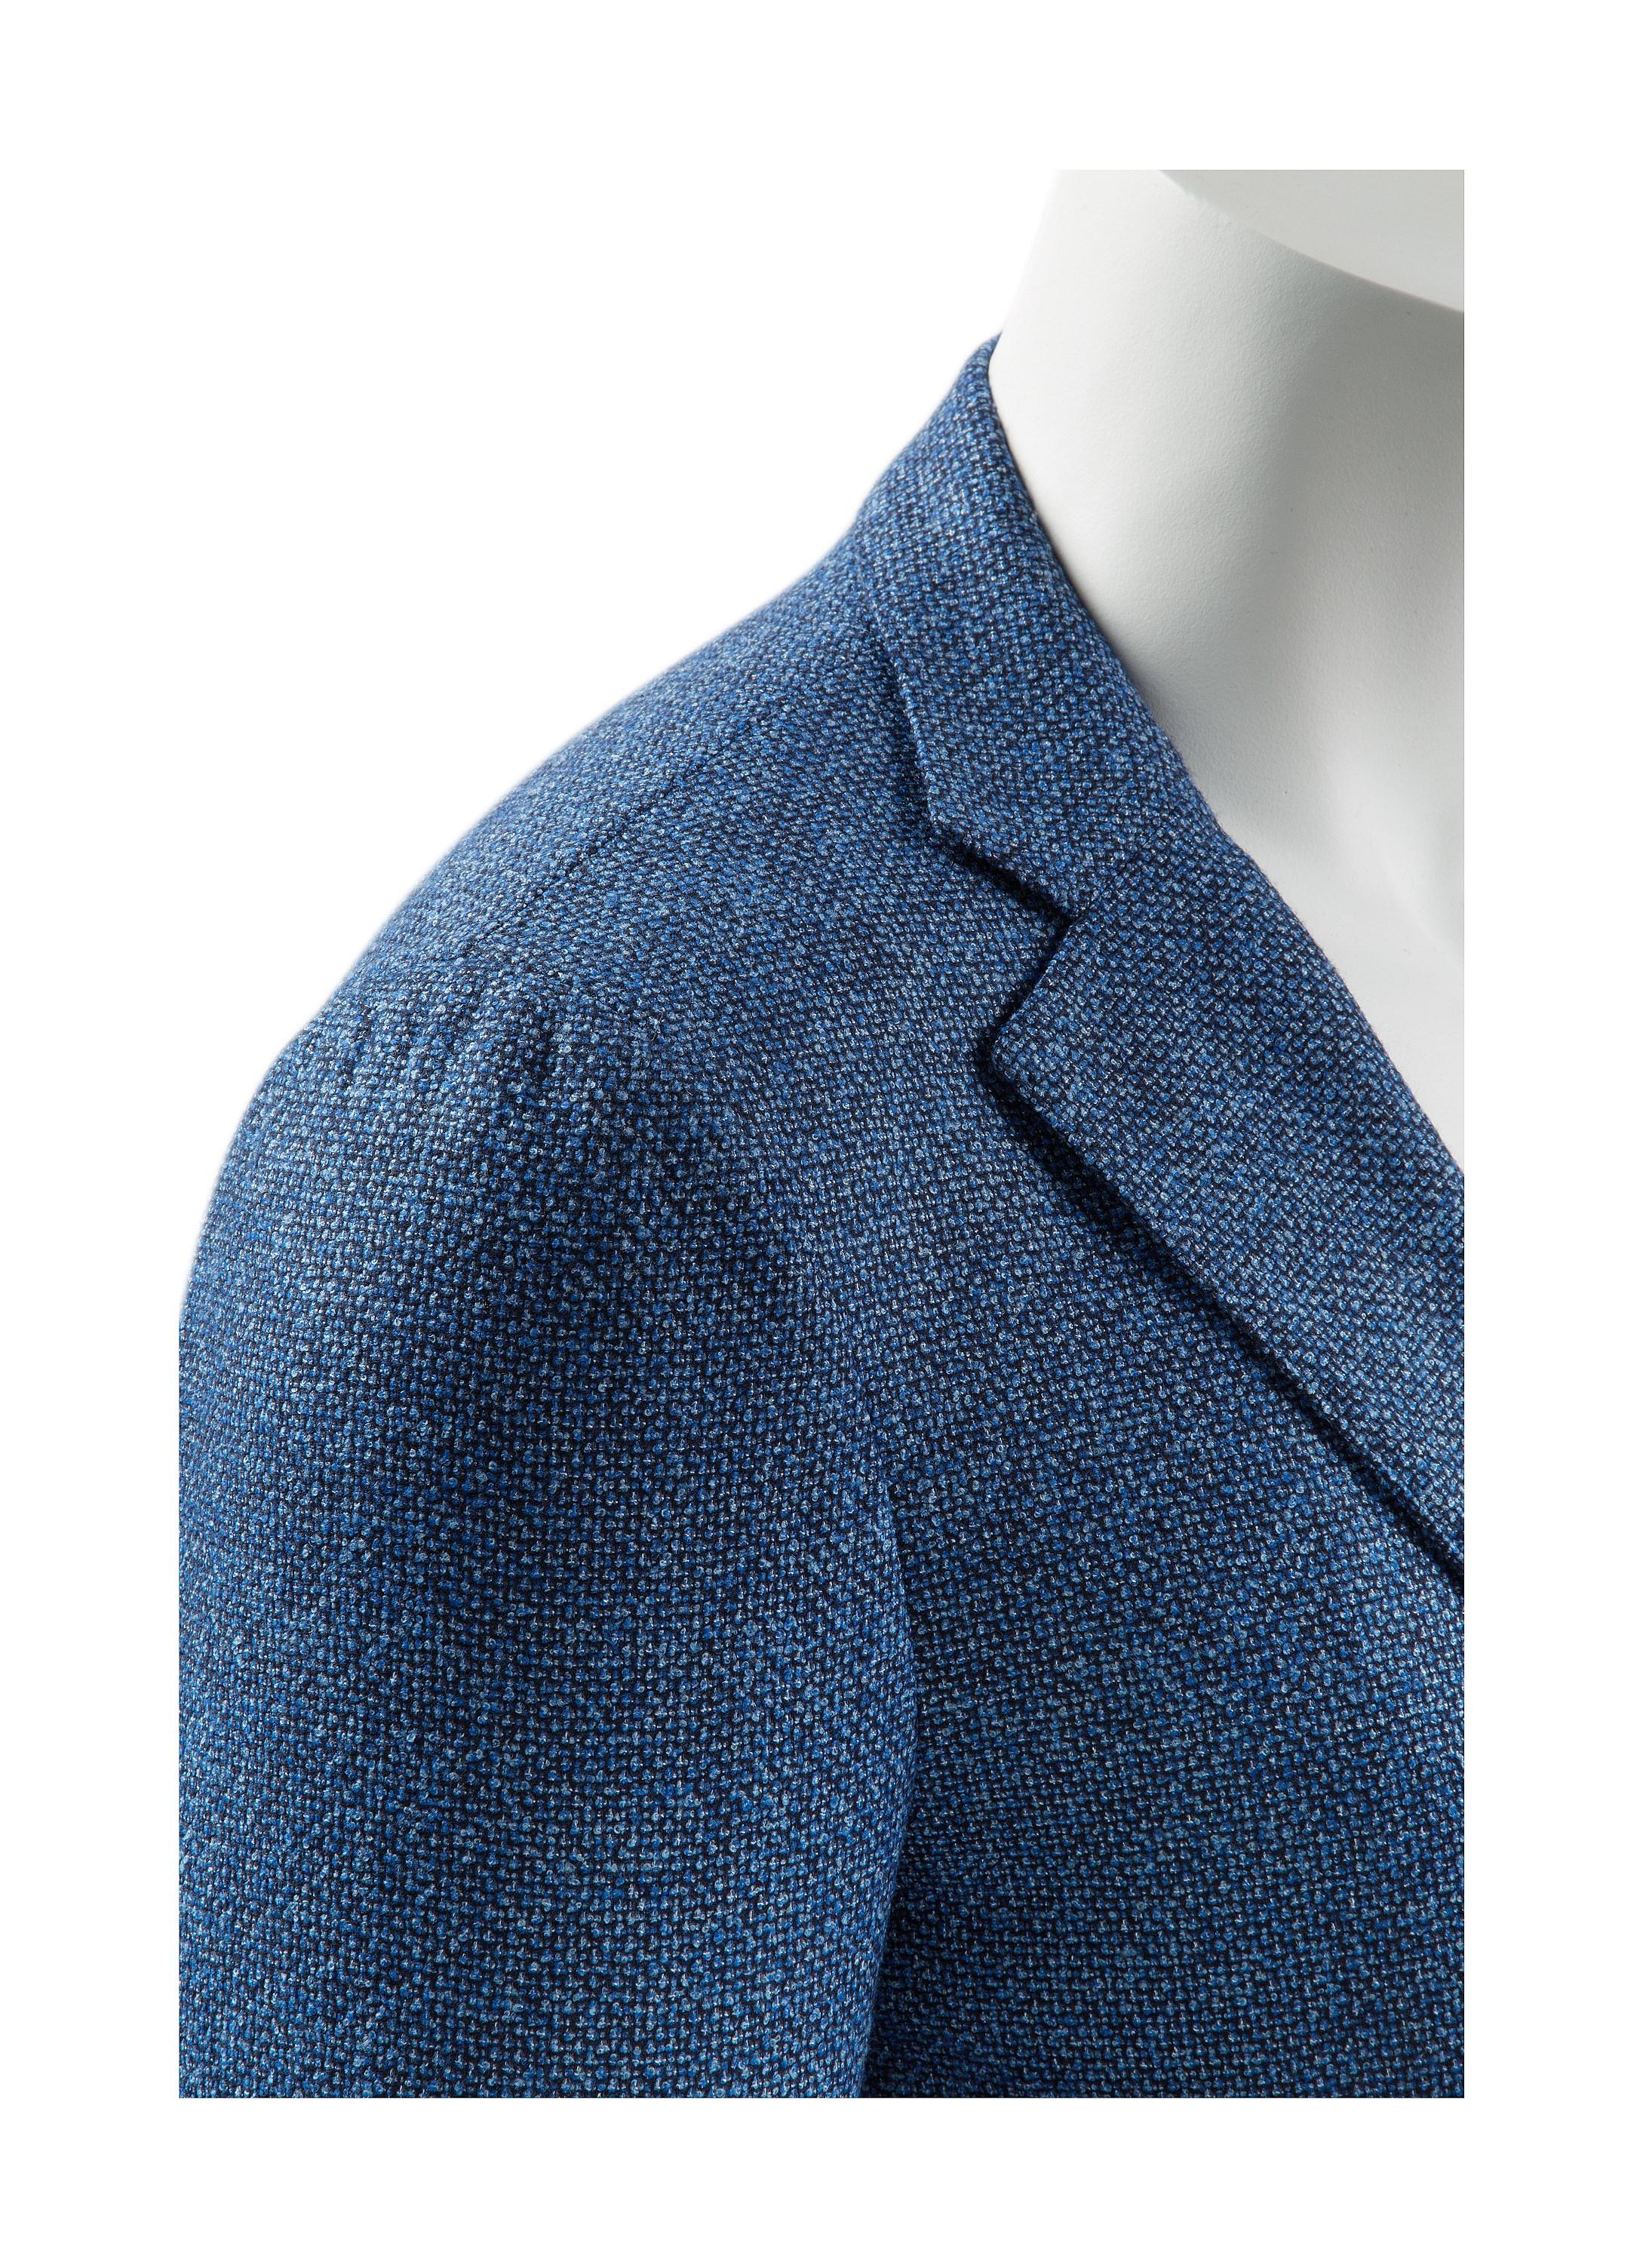 Jackets_Blue_Birds_Eye_Hudson_C908_Suitsupply_Online_Store_4.jpg